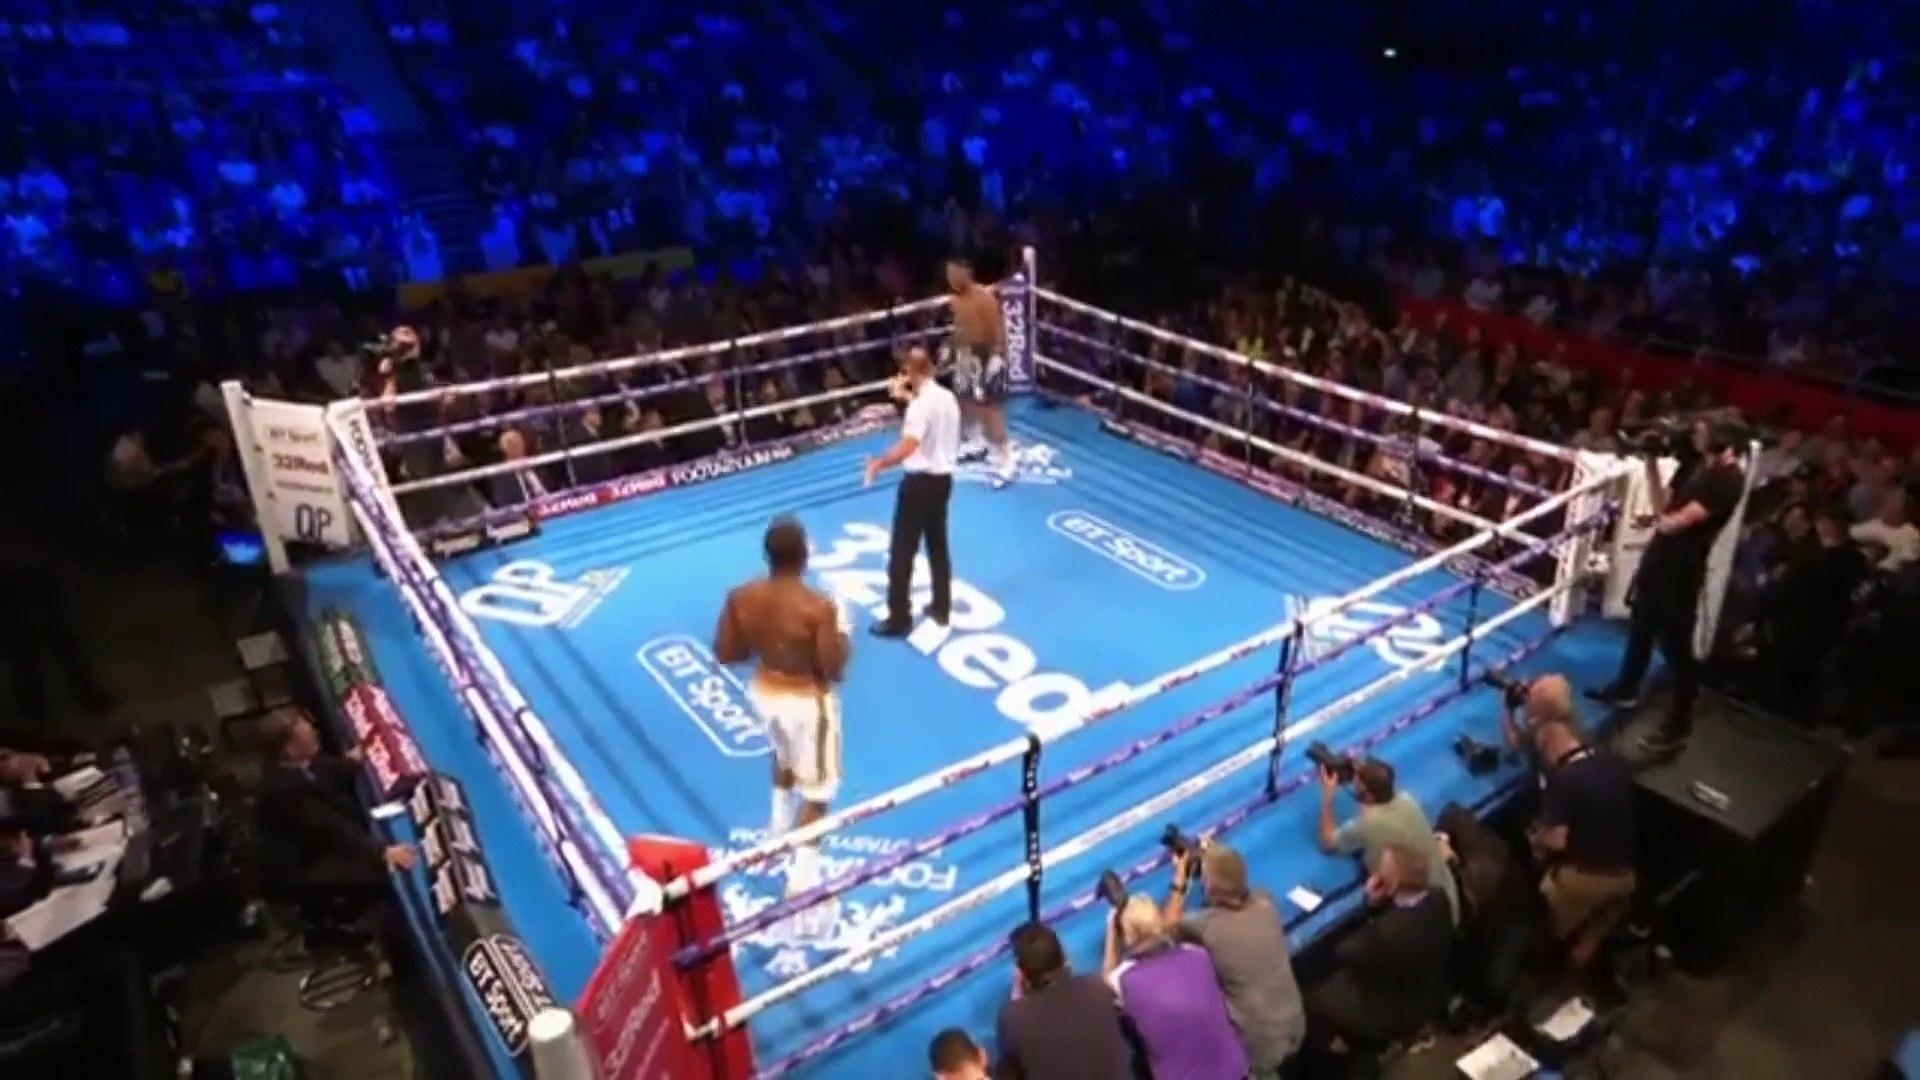 Joe Joyce VS Bryant Jennings HD FULL FIGHT boxing. Джо Джойс VS  Брайант Дженнингс полный БОЙ БОКС